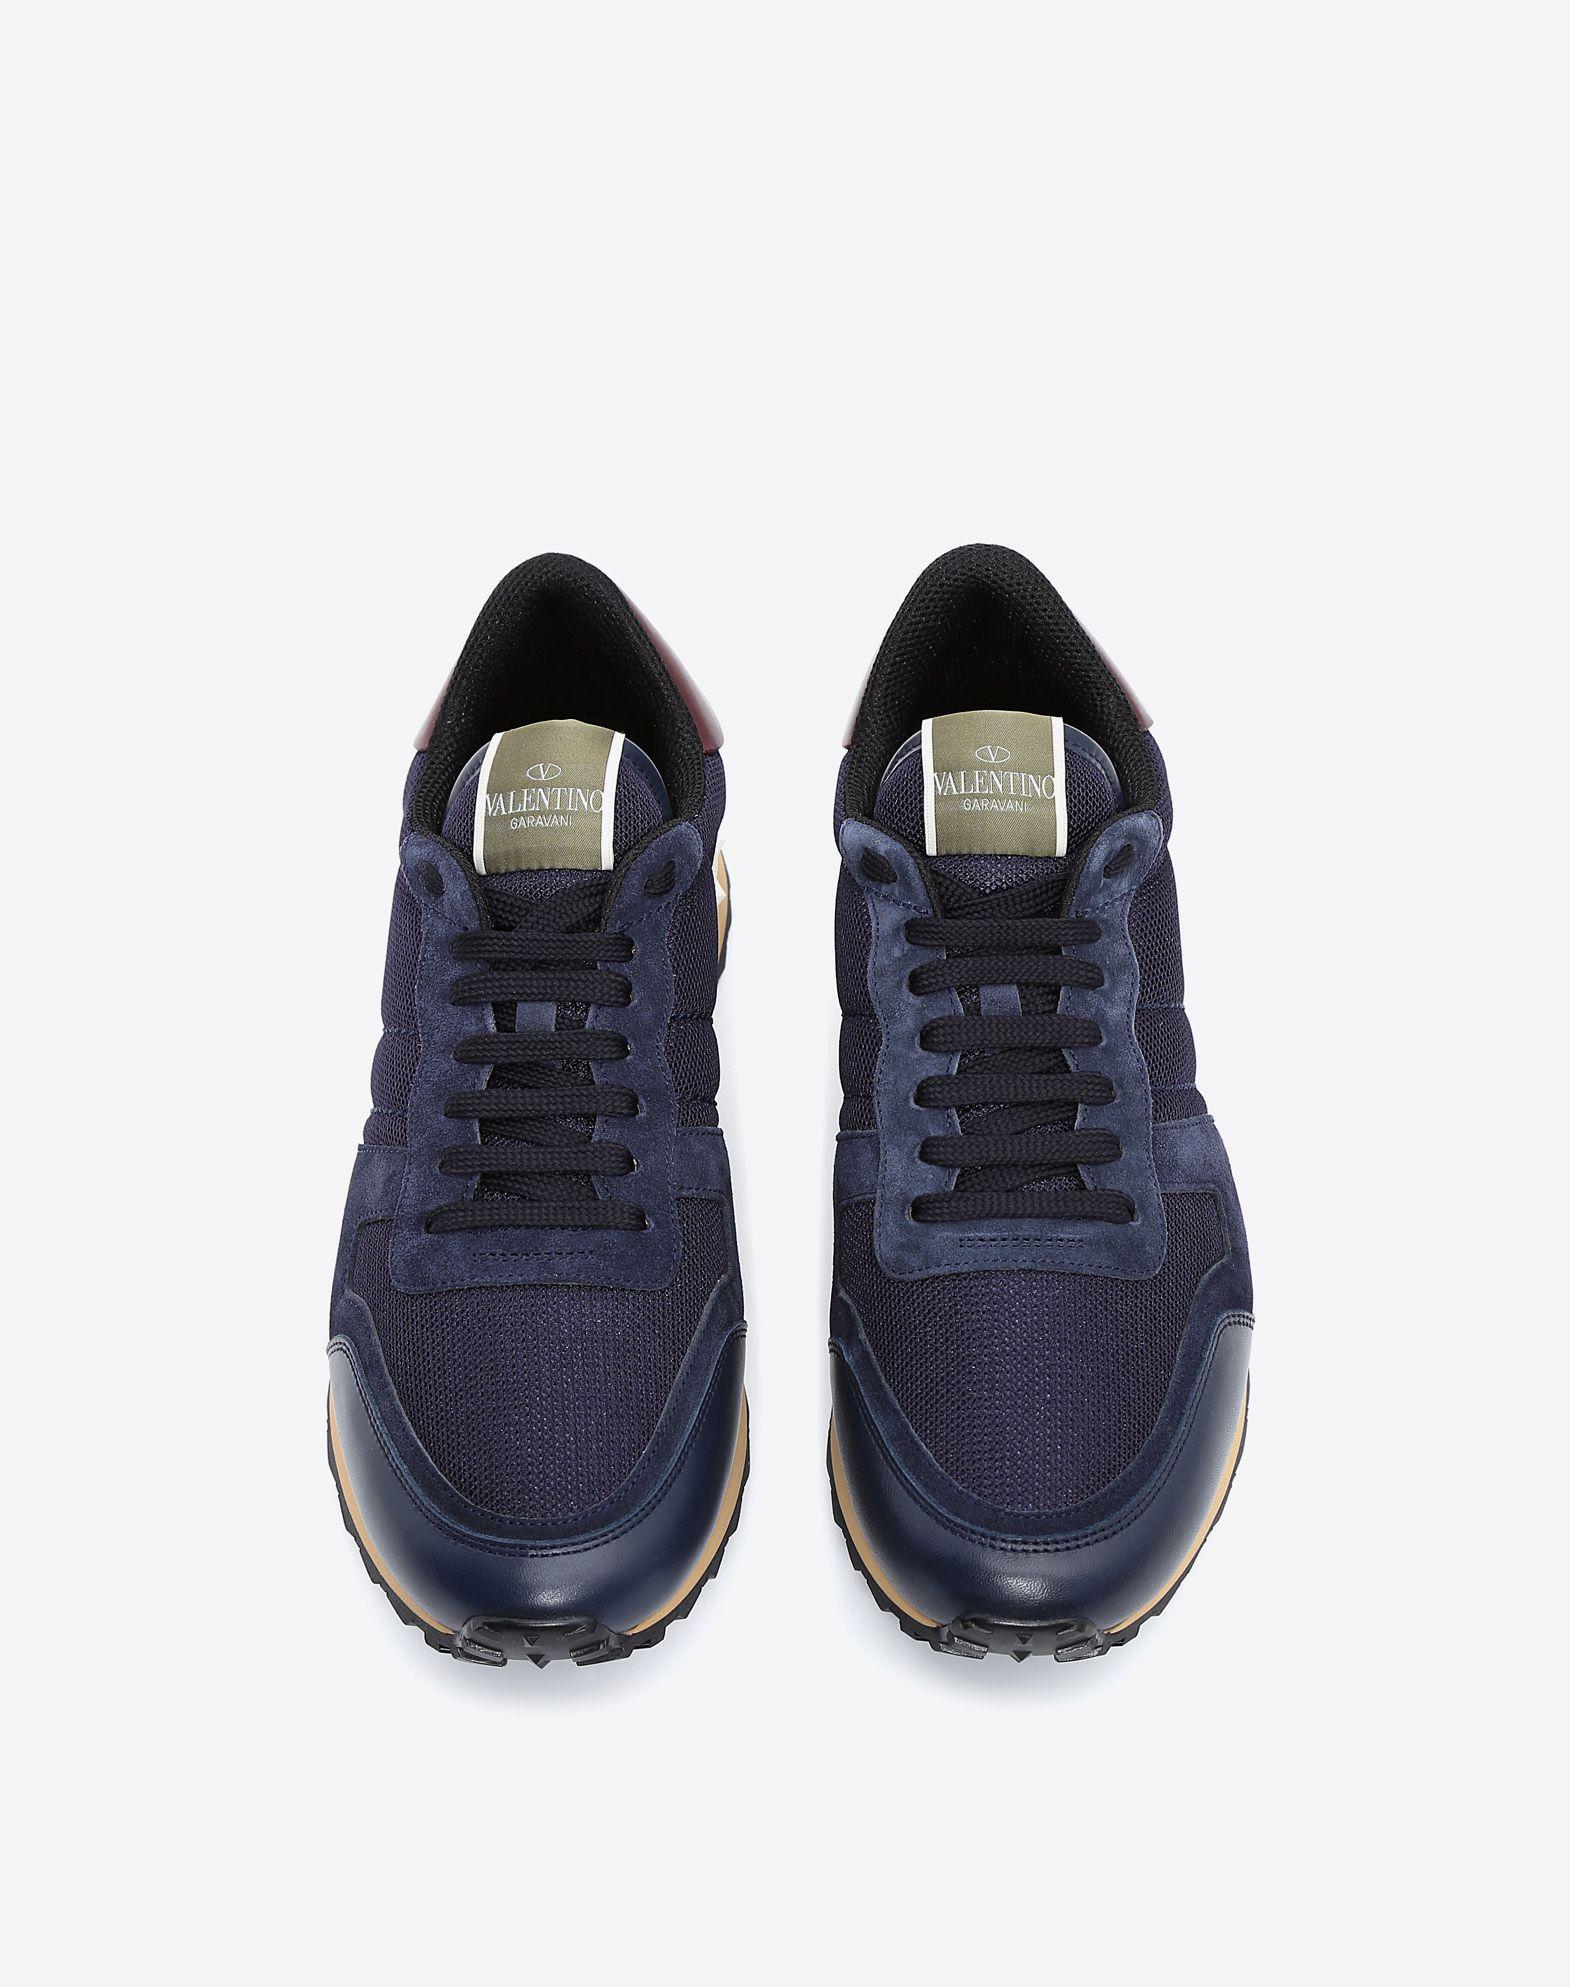 VALENTINO GARAVANI UOMO MY2S0723TCV H07 Sneaker U e